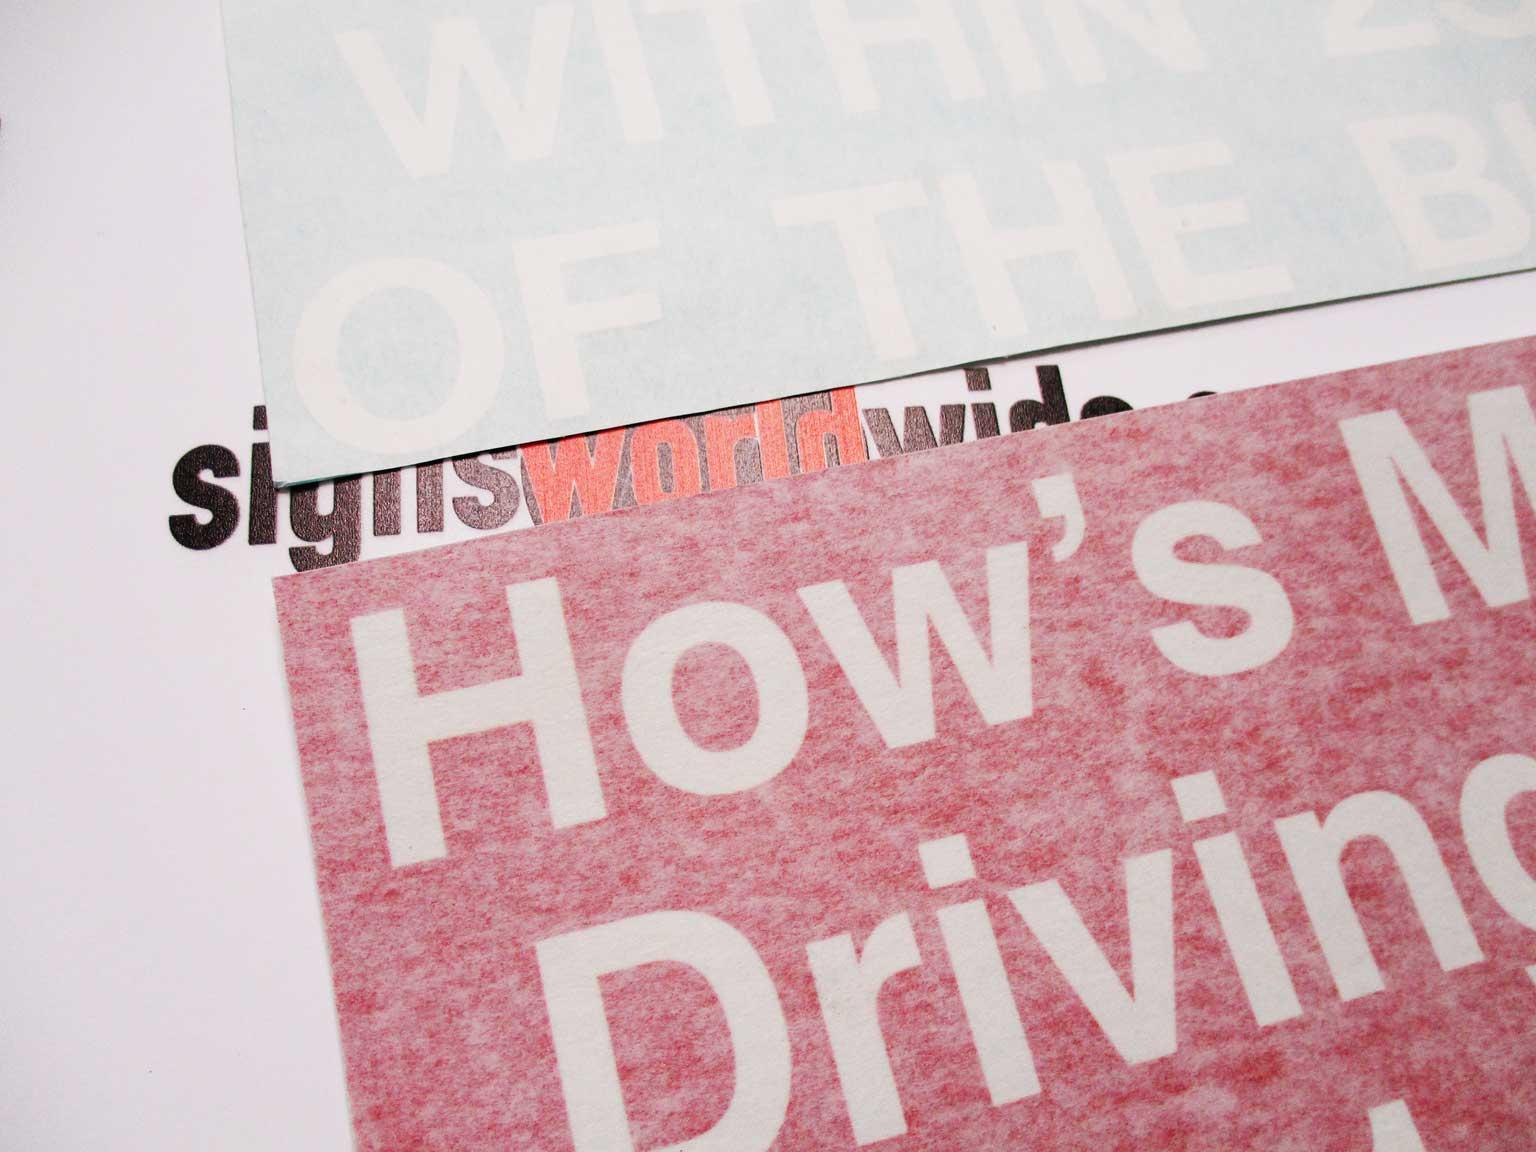 SWW-Cut-vs-Print-front